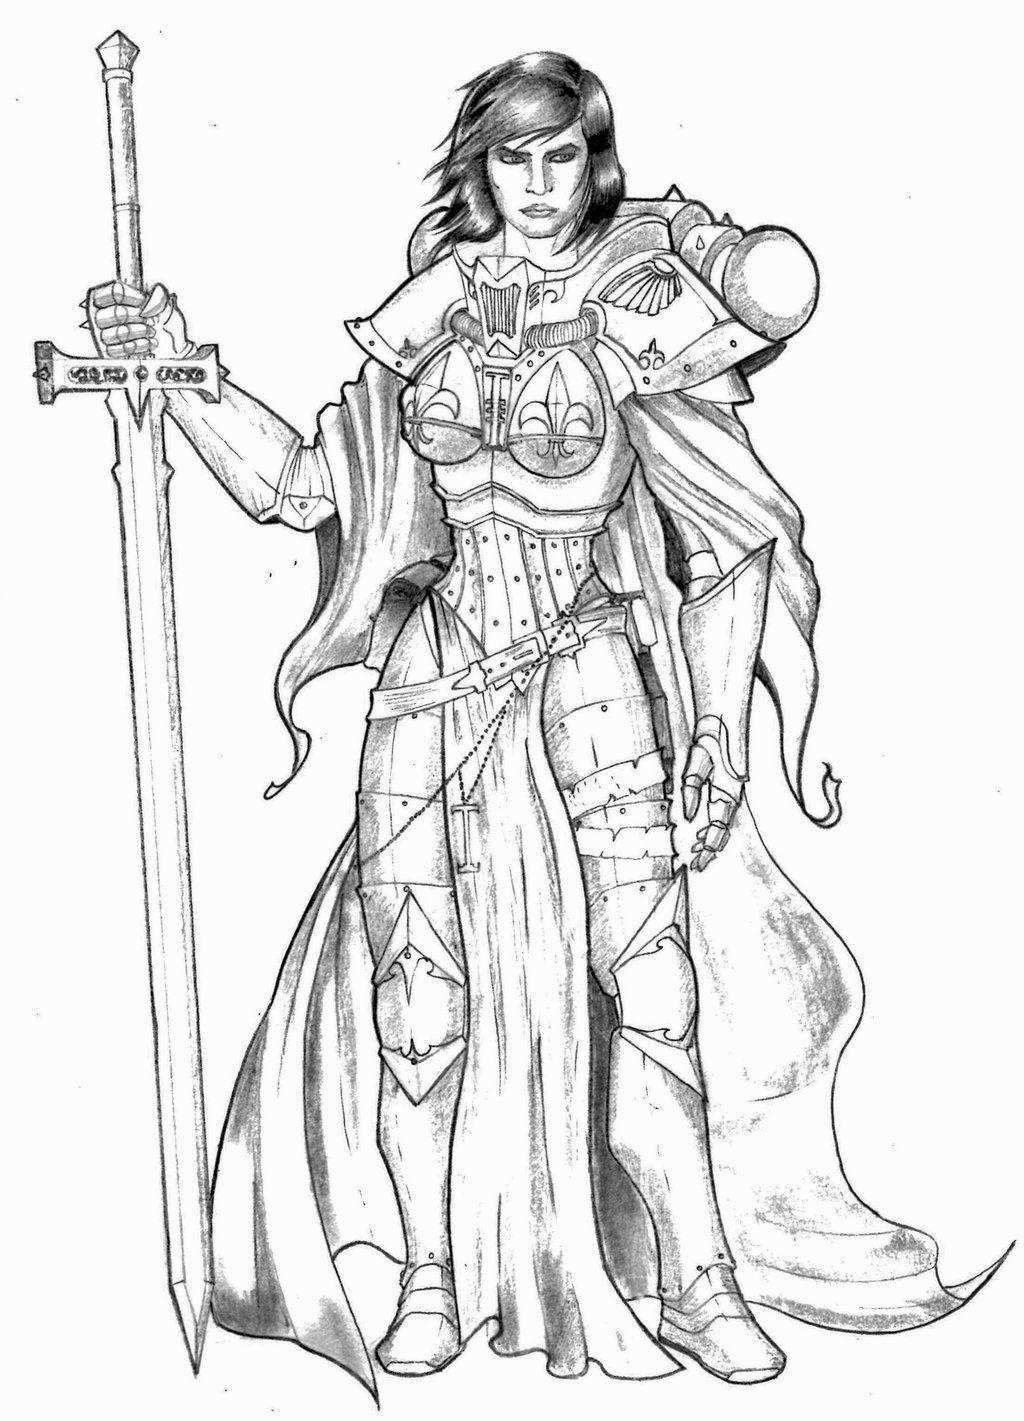 imperium khadoran-man lineart mantle sisters_of_battle sword